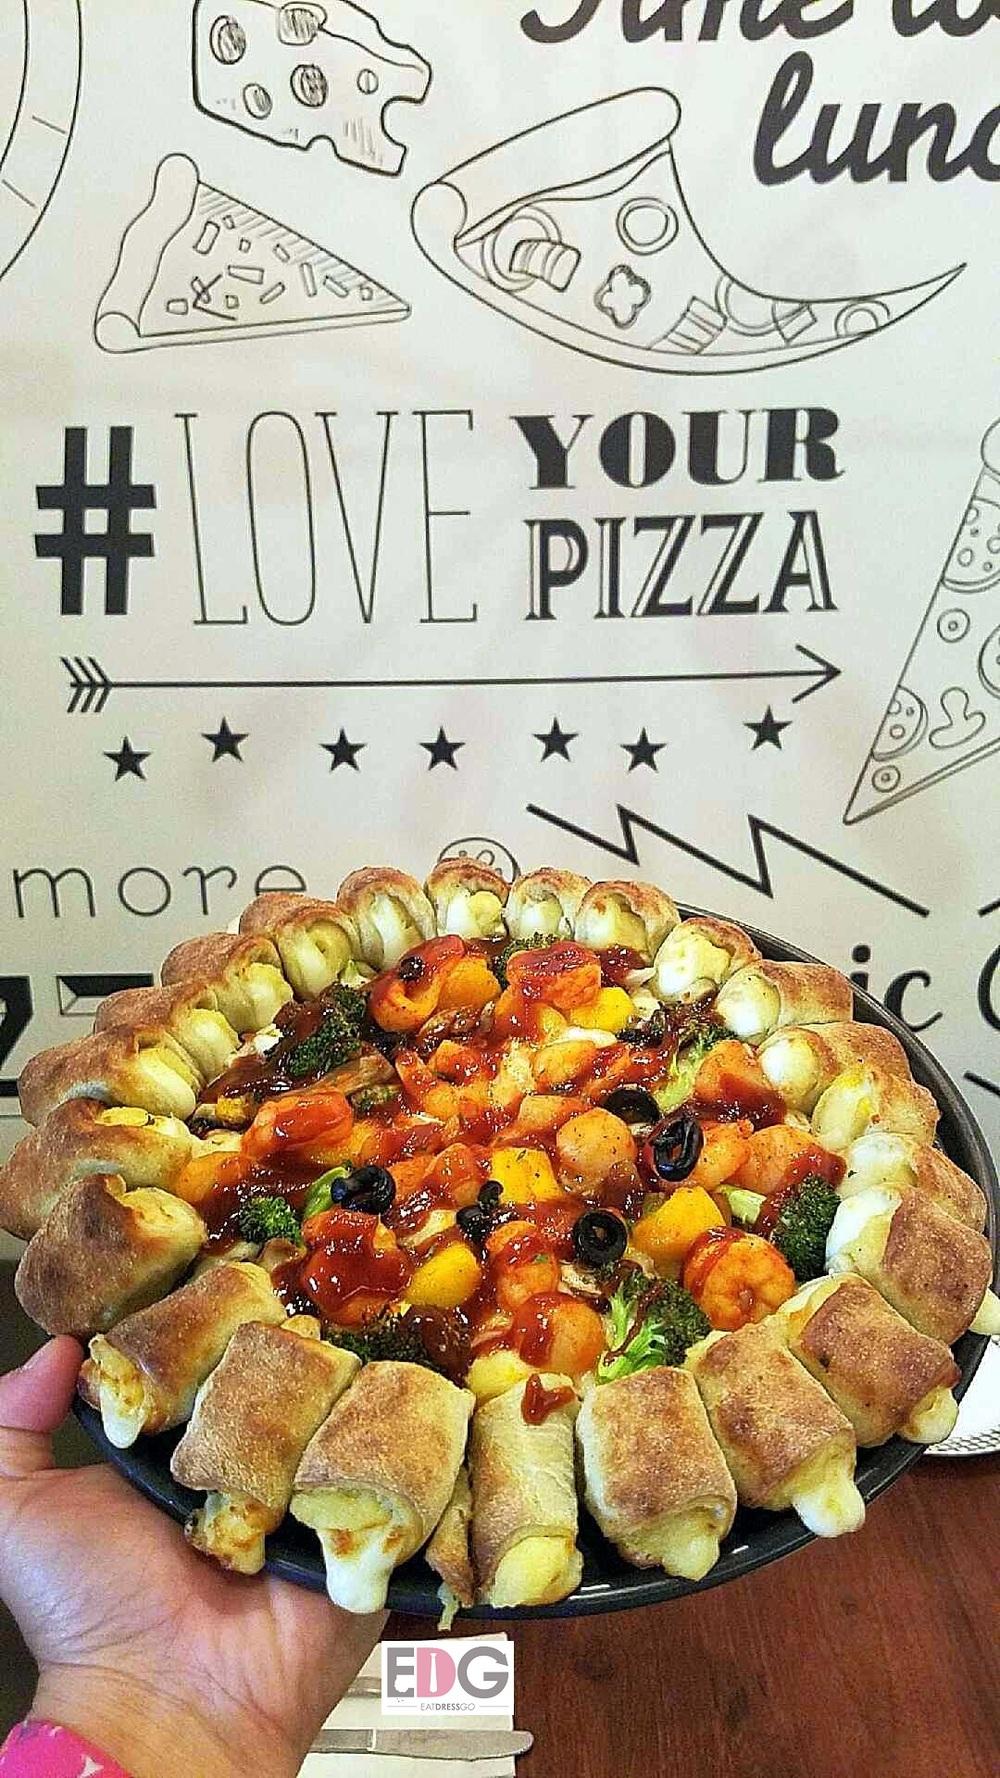 Pizzamaru_Seafood Mango Pizza.jpg